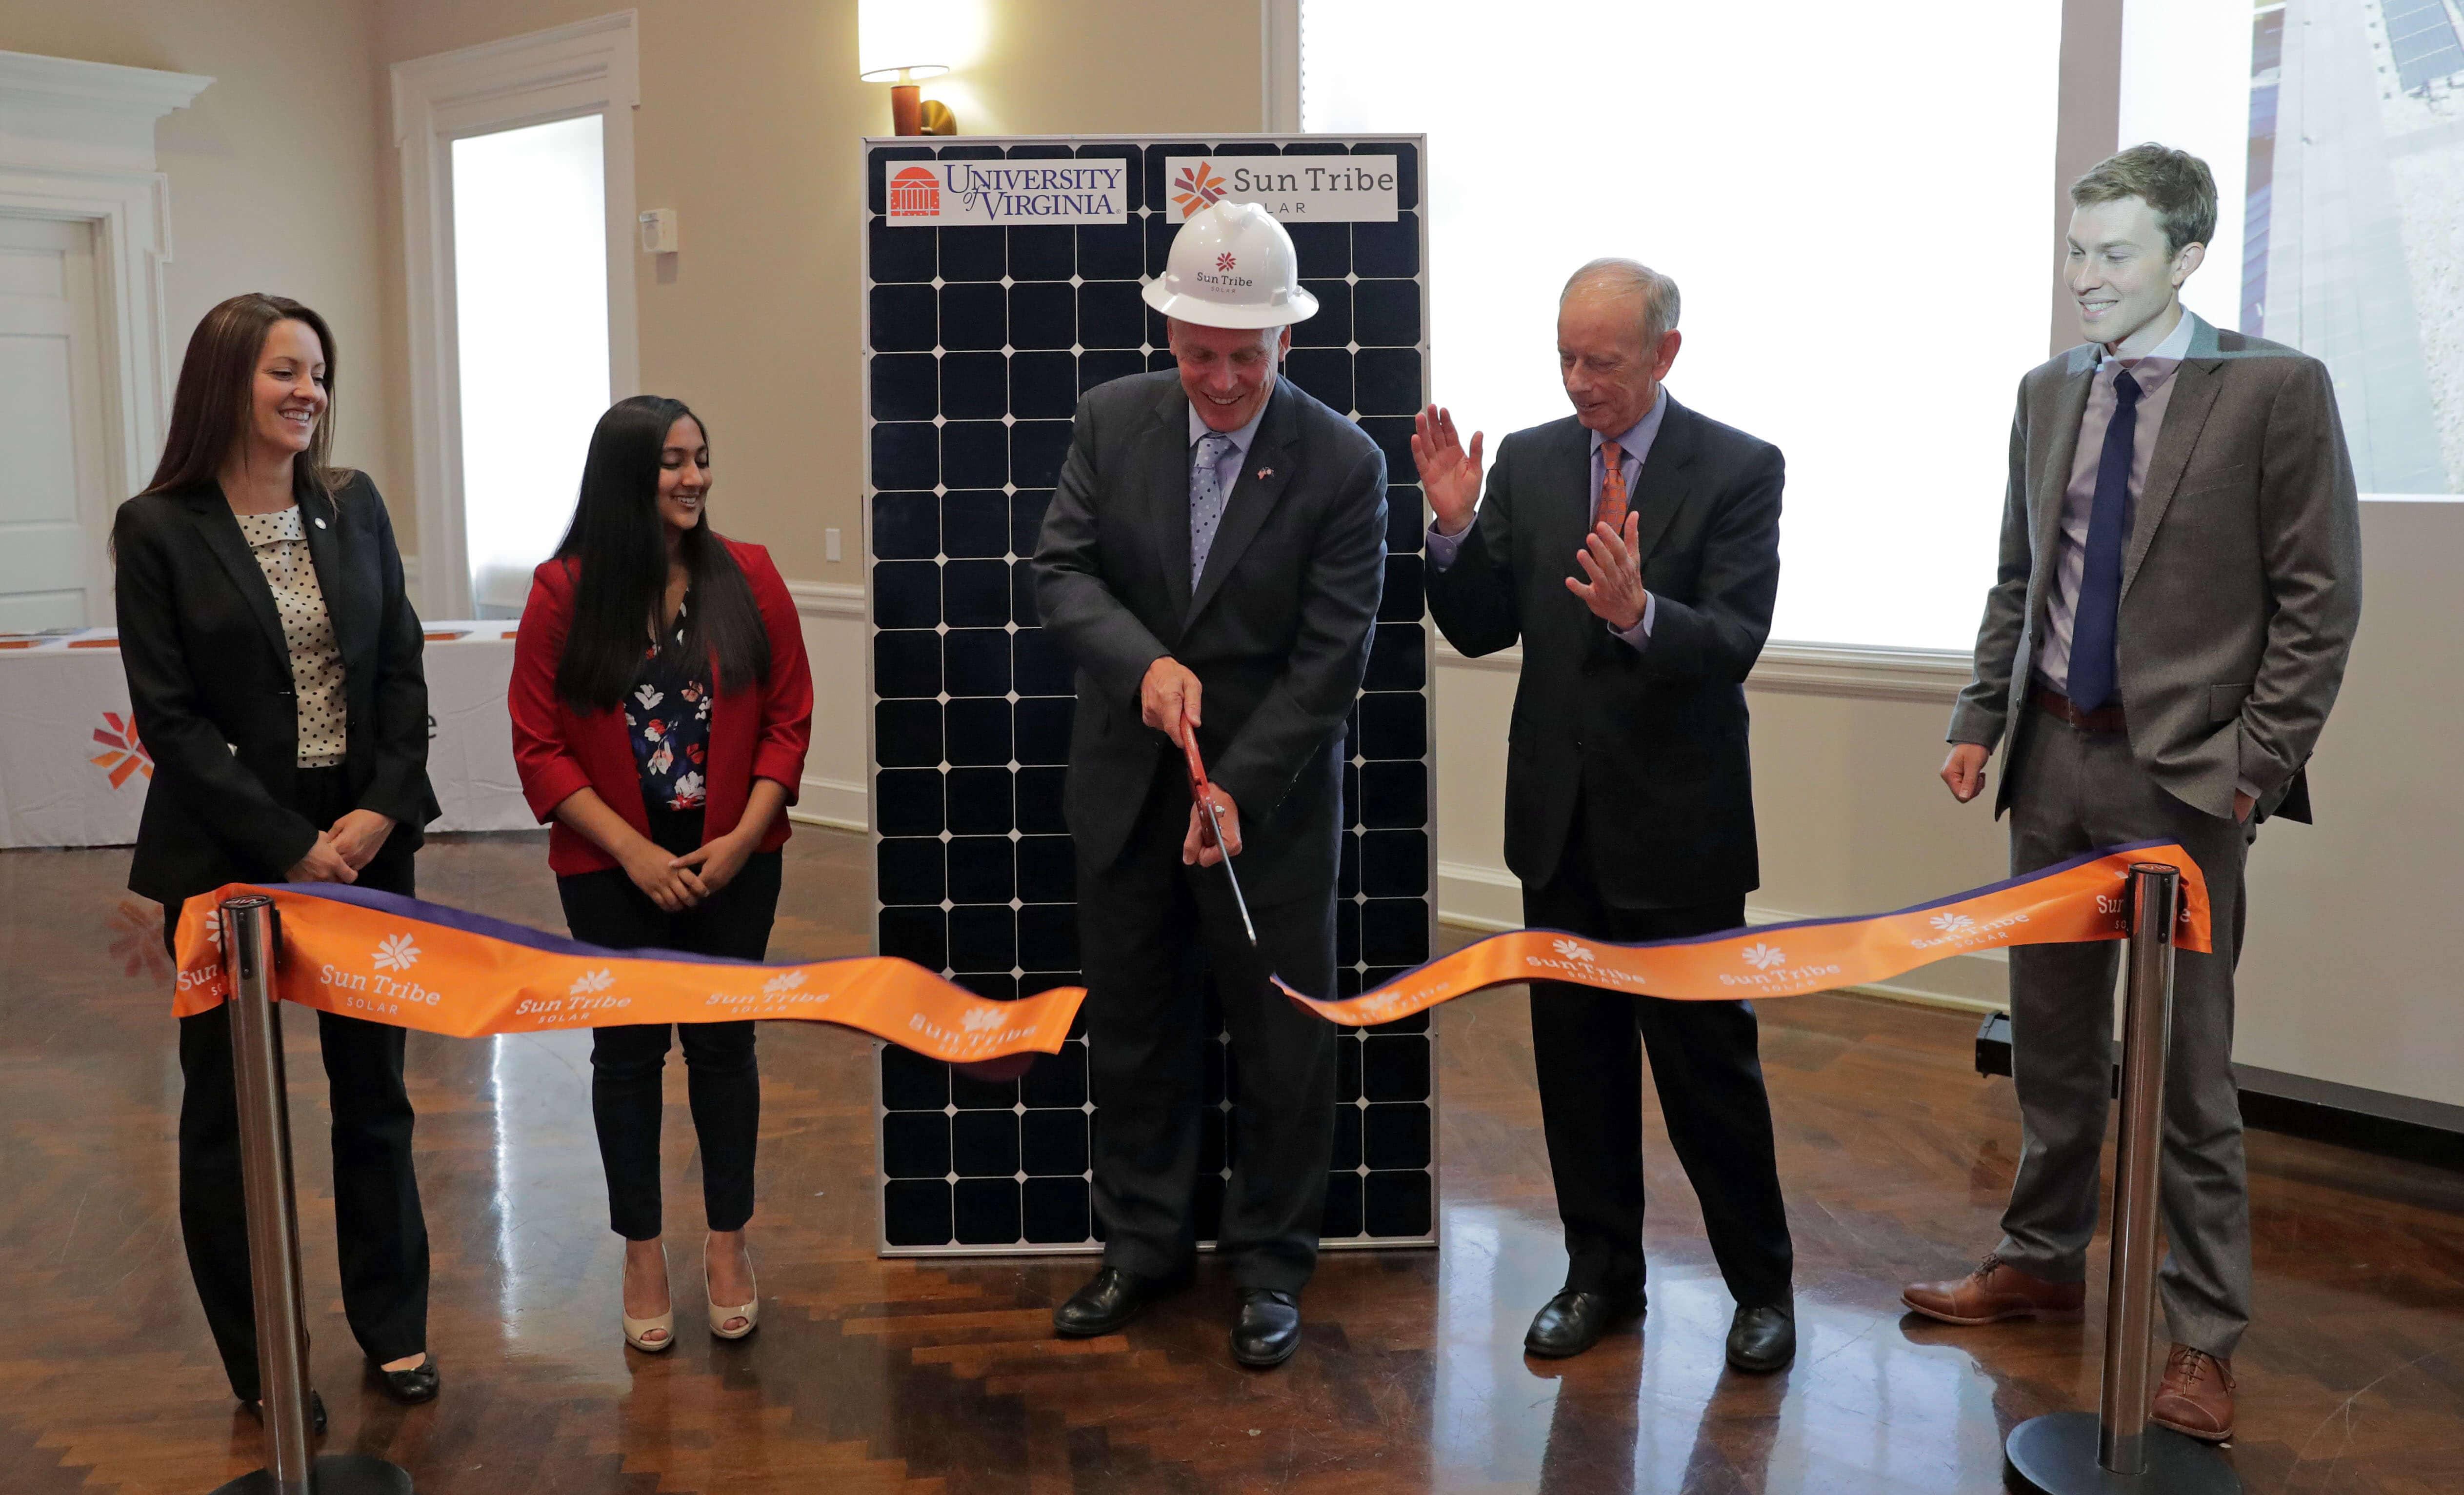 Virginia University Of Virginia Solar Project Turns Library Into 'Living Laboratory'